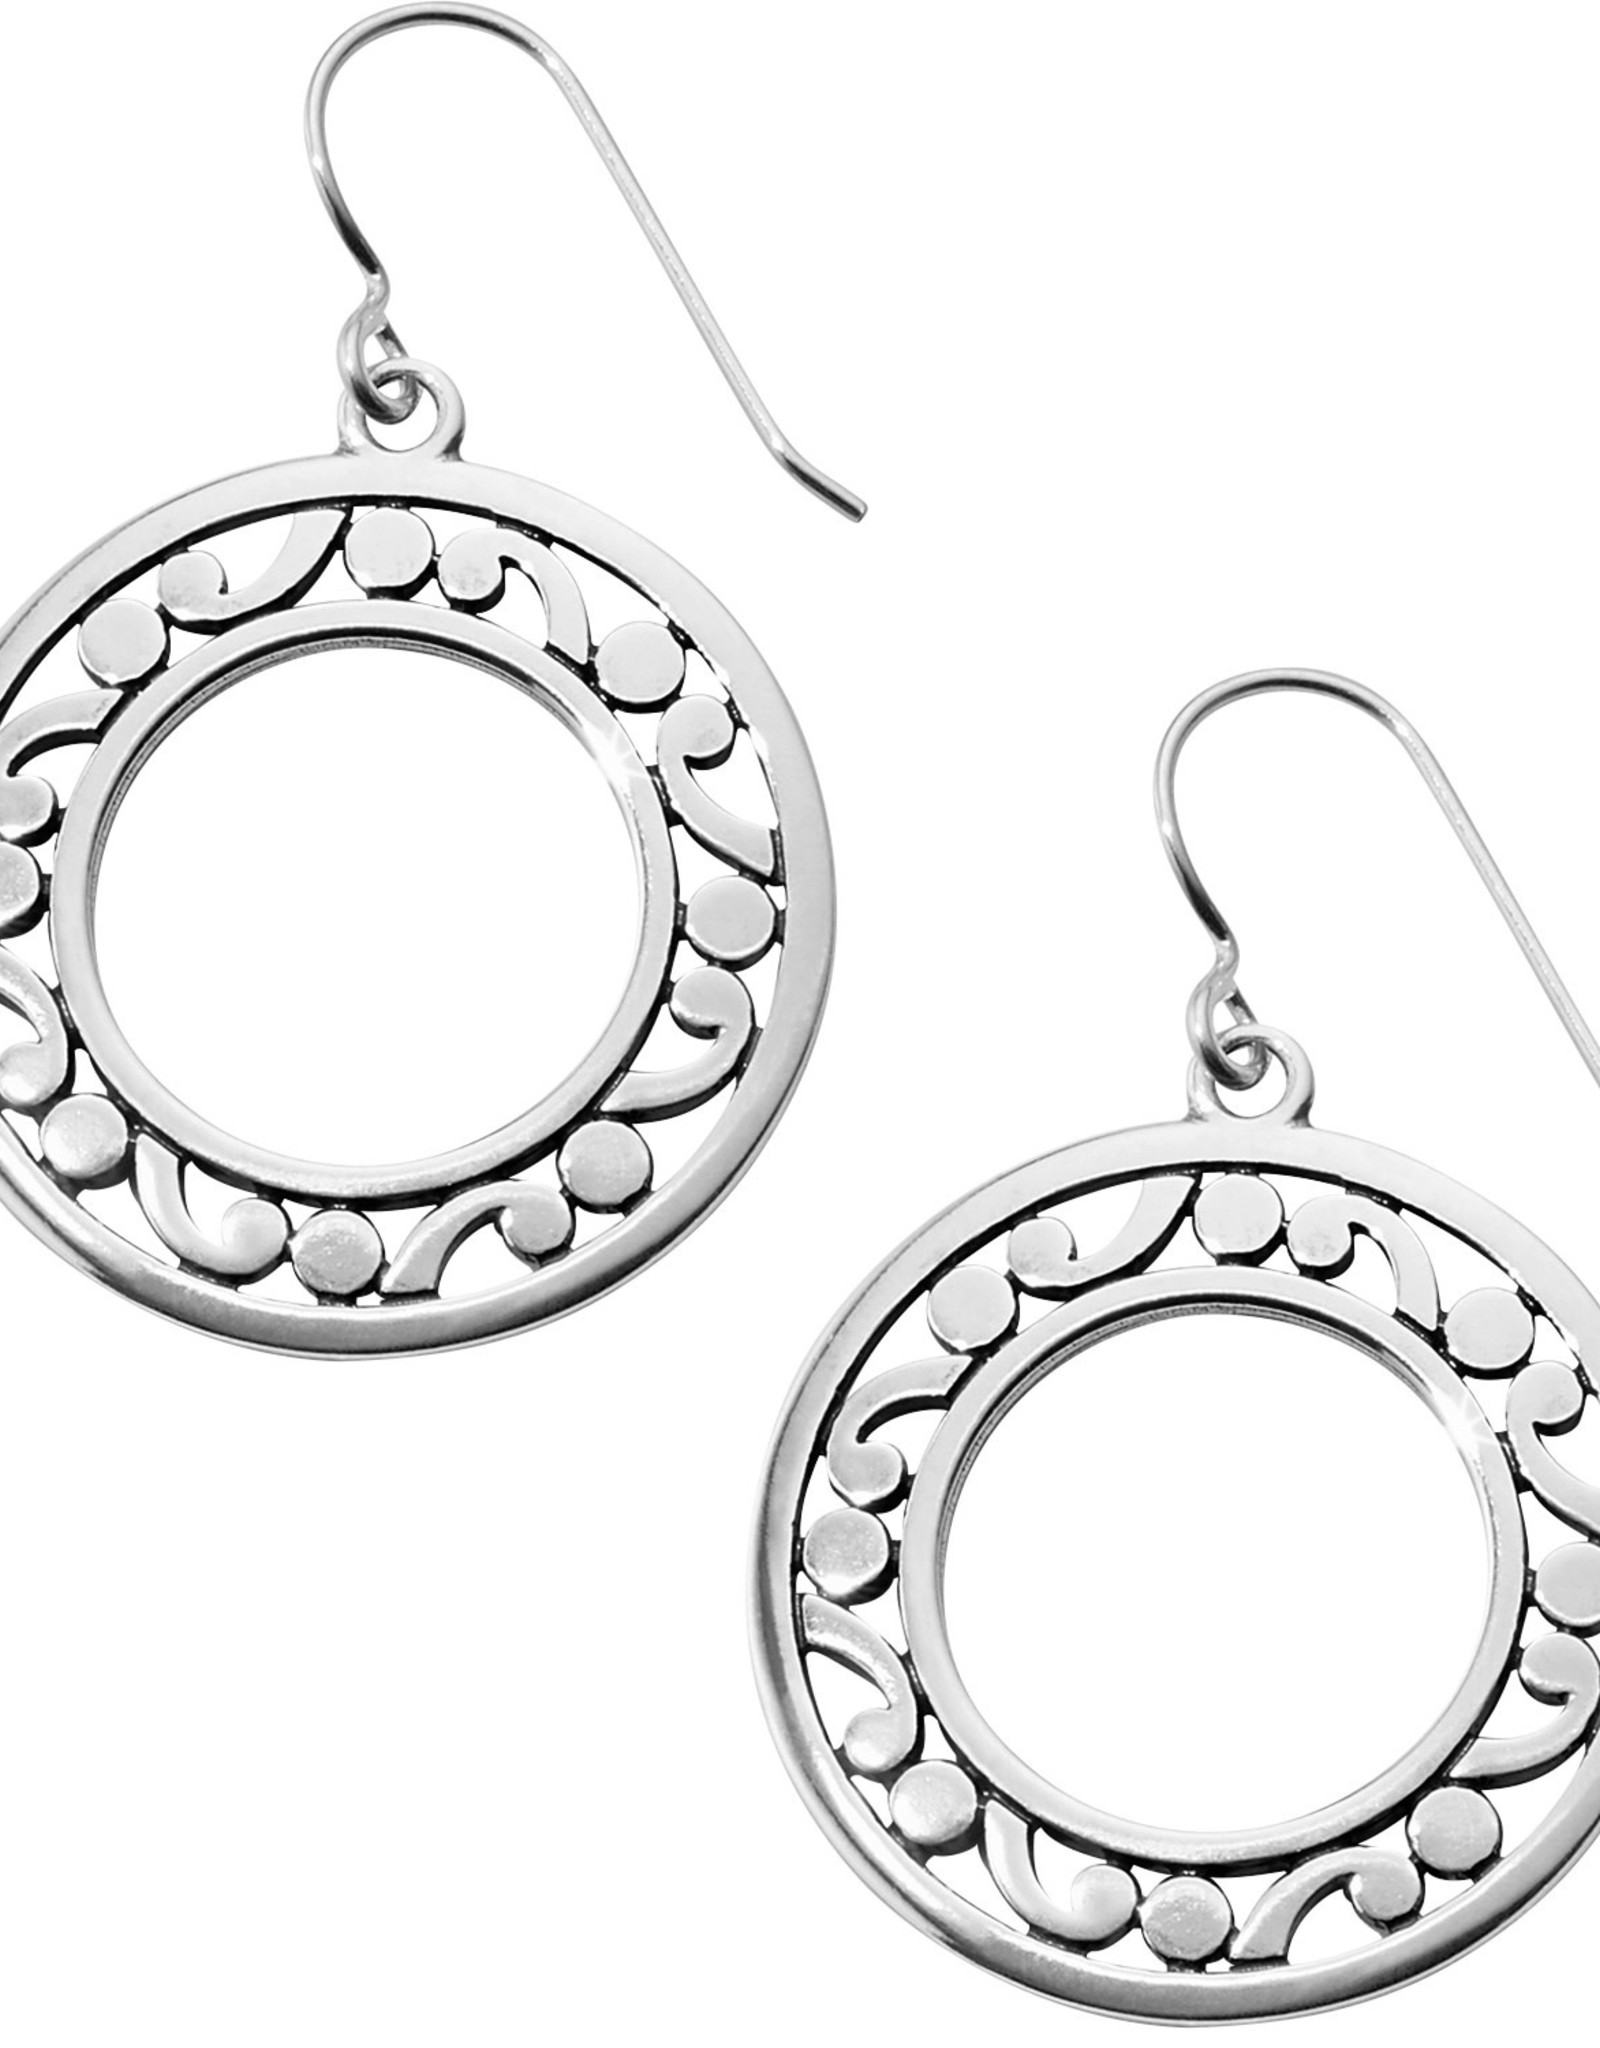 Brighton Brighton, Contempo Open Ring French Wire Earrings